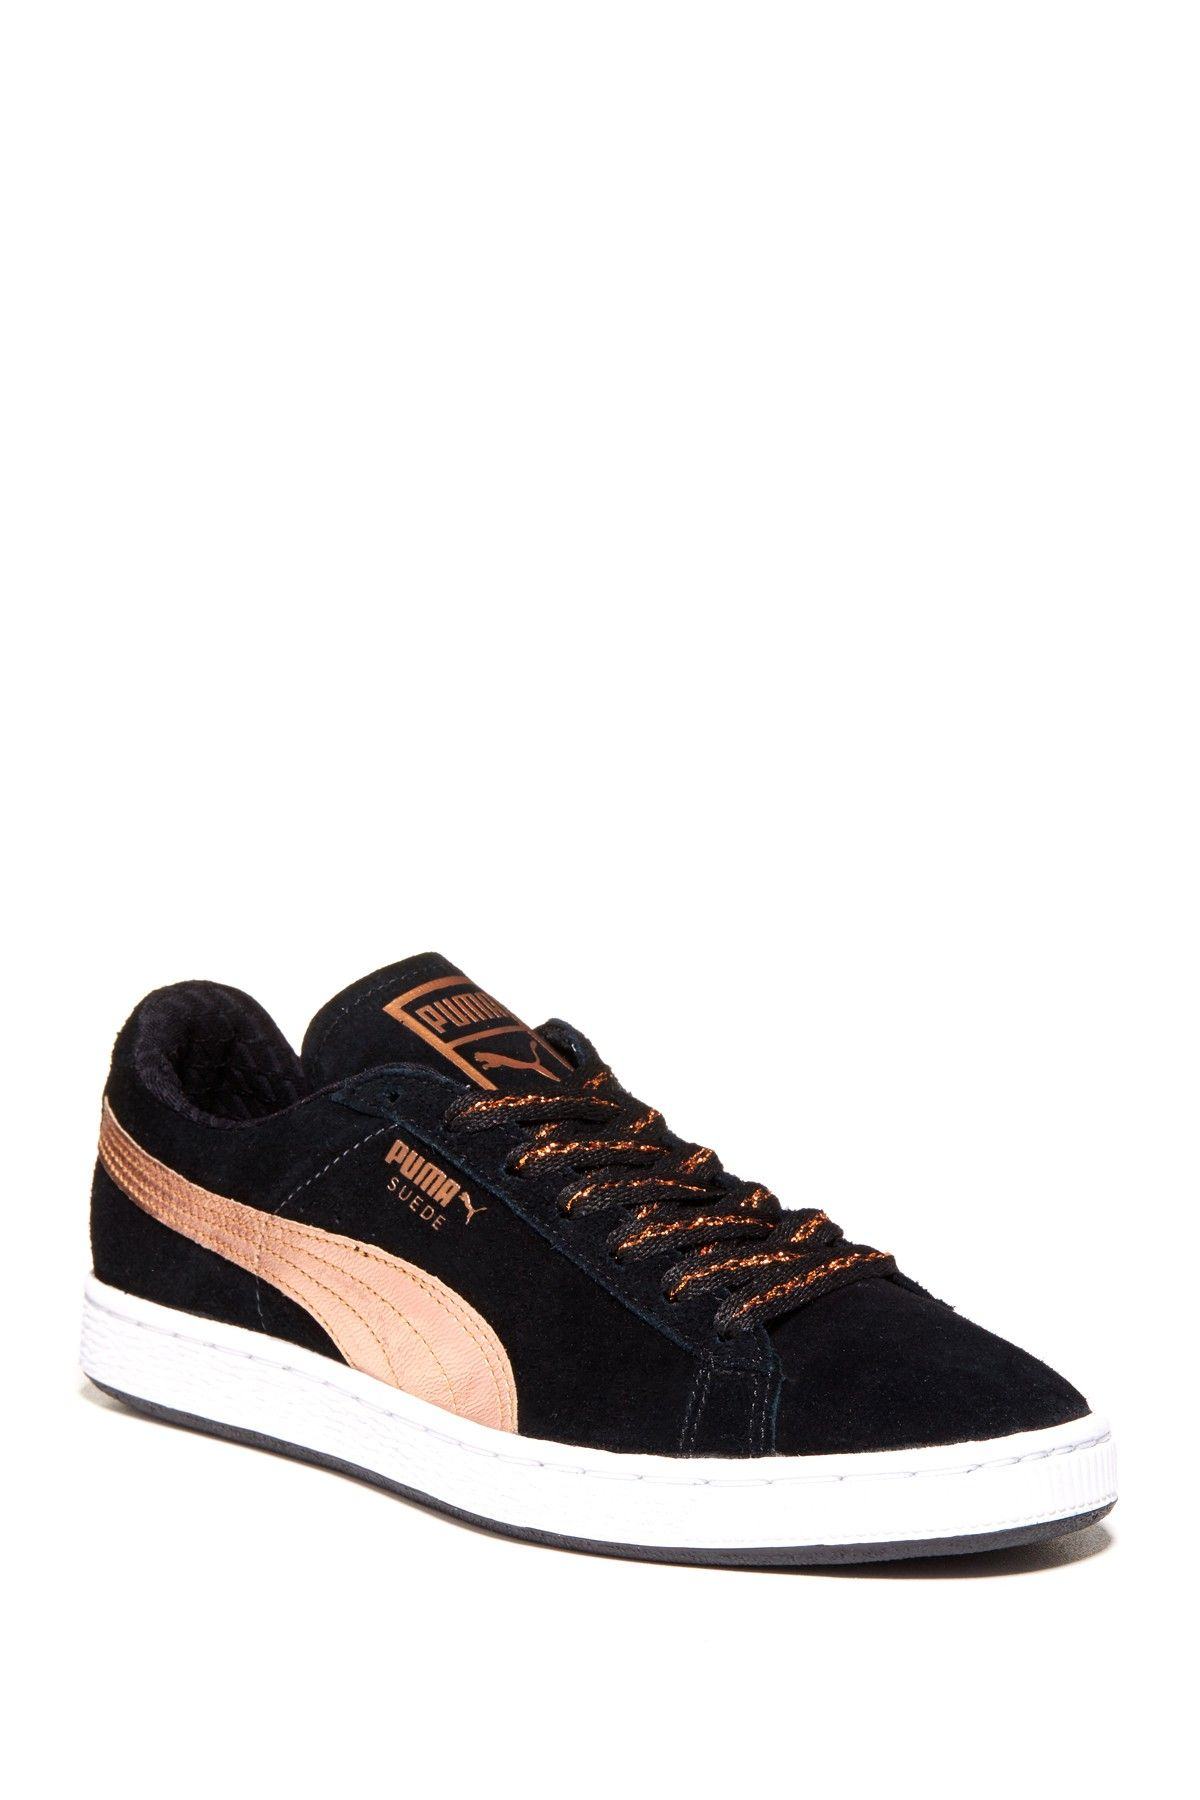 PUMA Suede Classic Sneaker on HauteLook